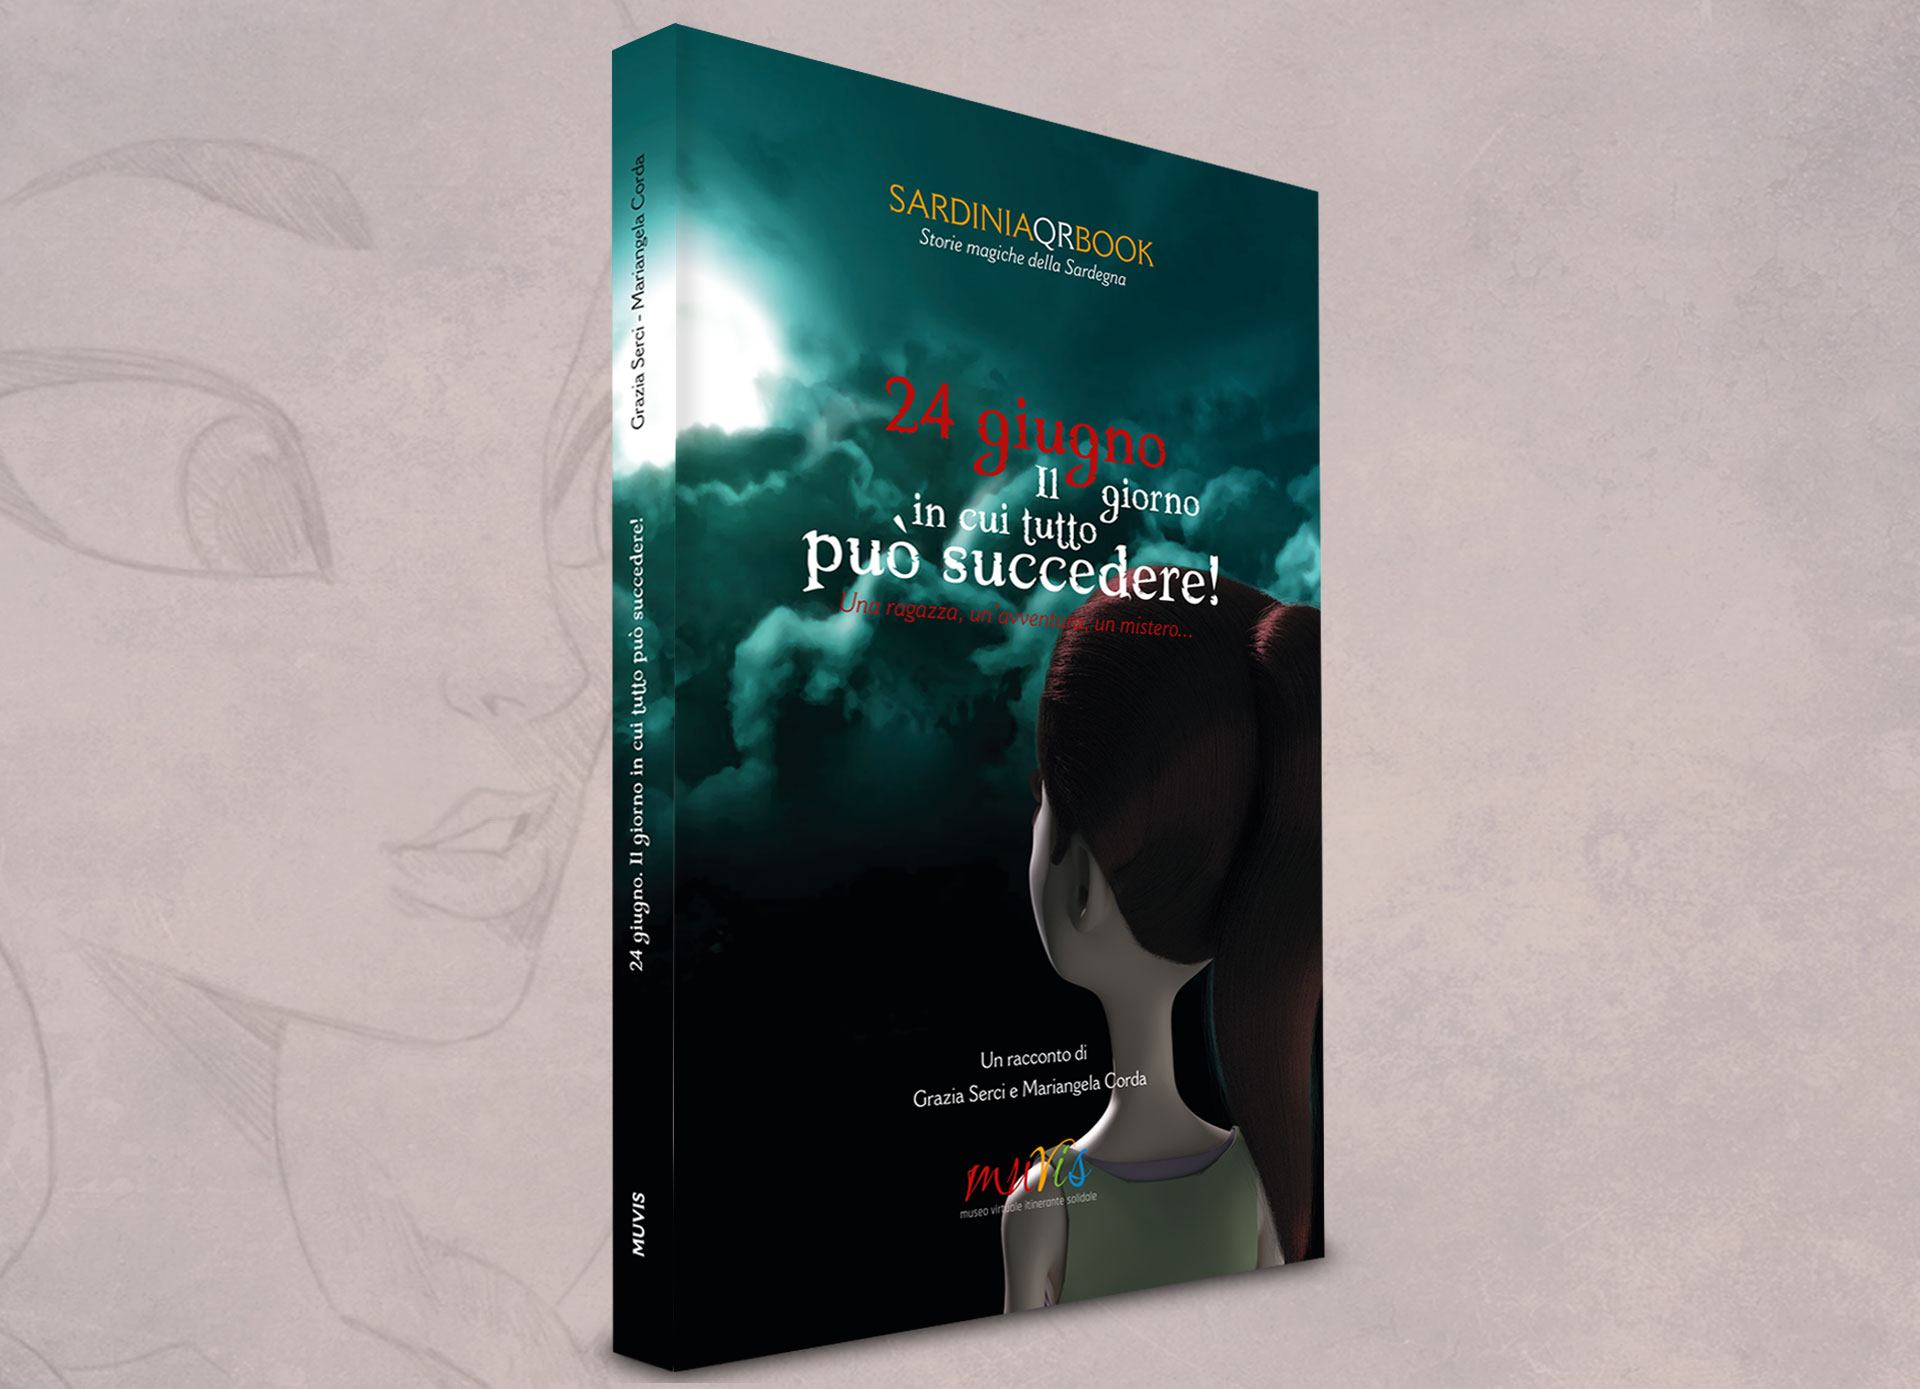 Sardinia QR Book